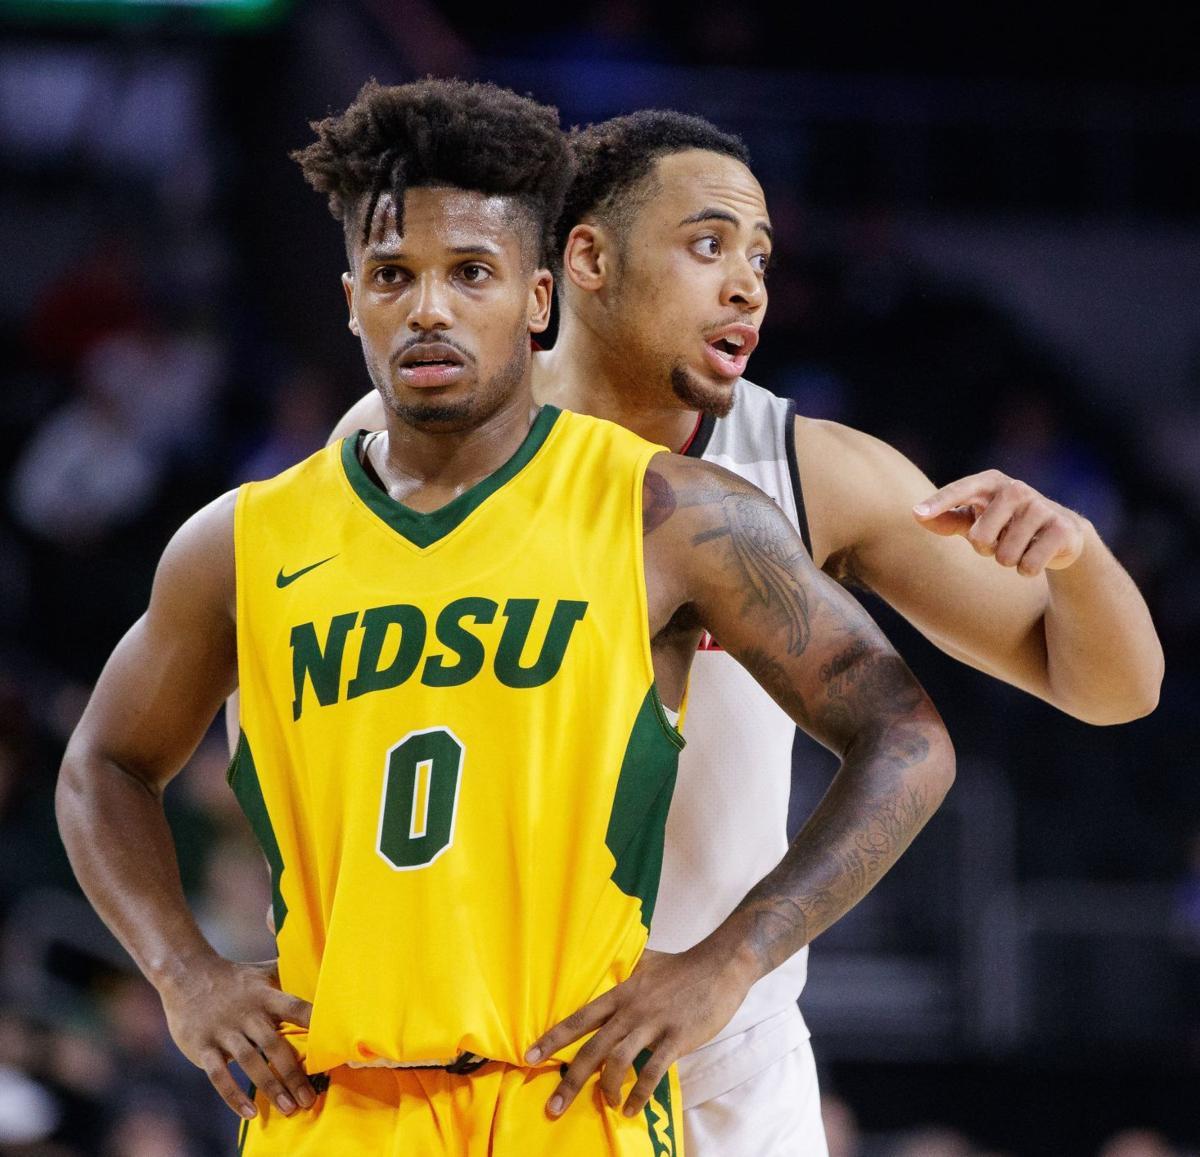 Shatel: UNO's season comes tantalizingly close to NCAA tournament, but future is bright for Mavs